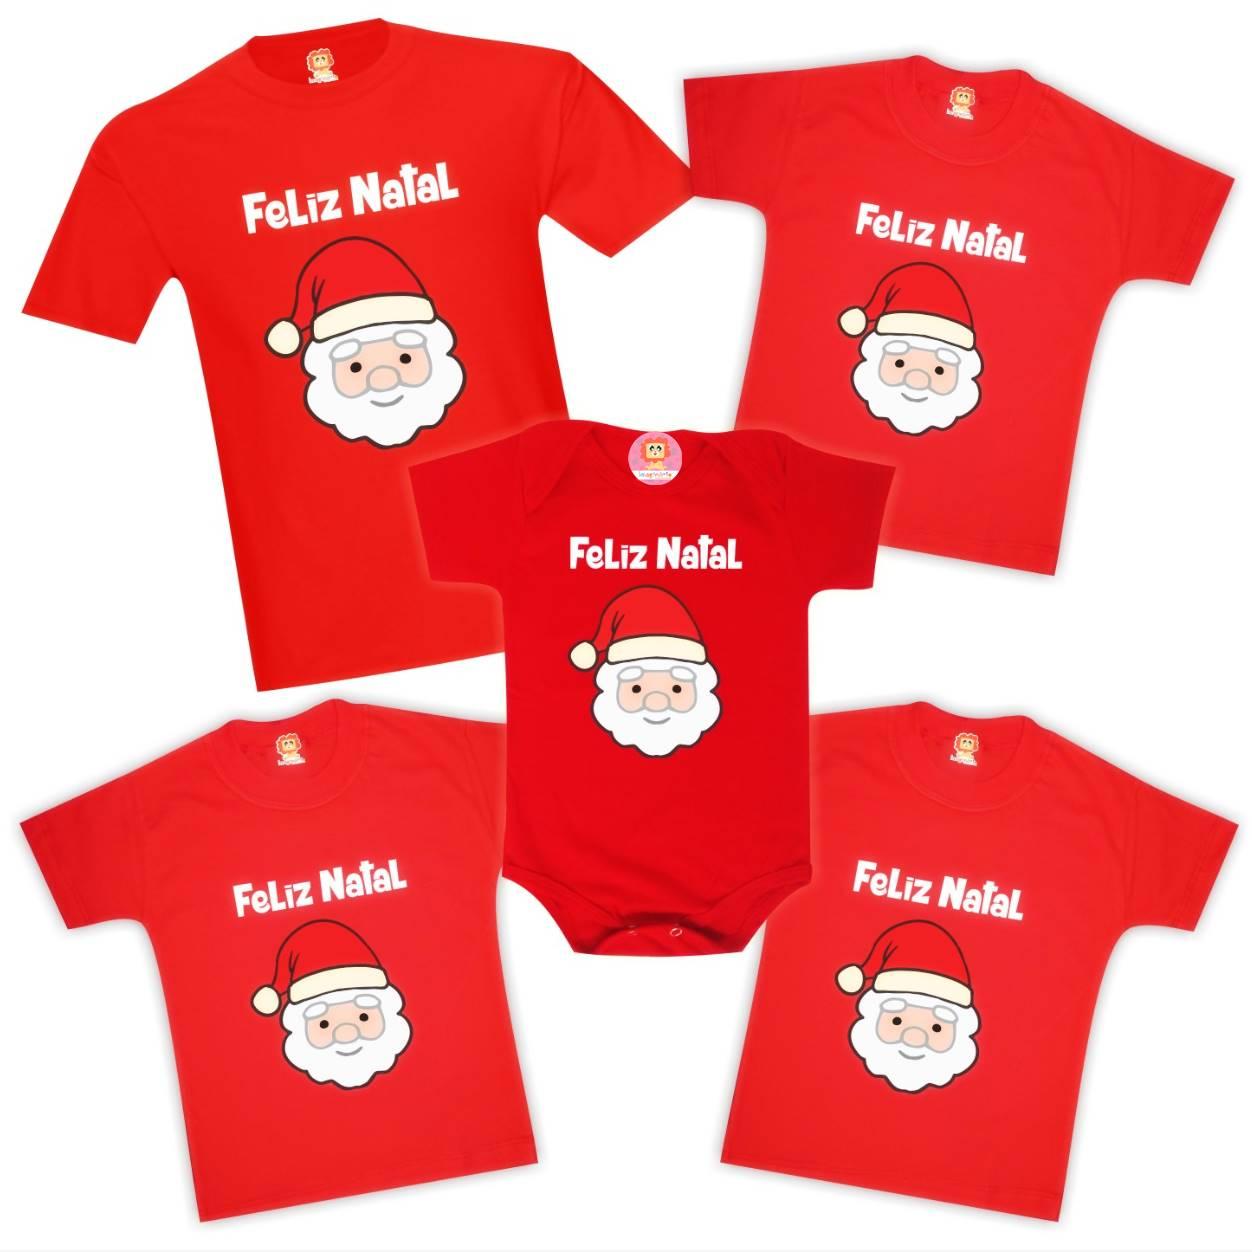 Kit Camisetas Feliz Natal Família Papai Noel 5 peças